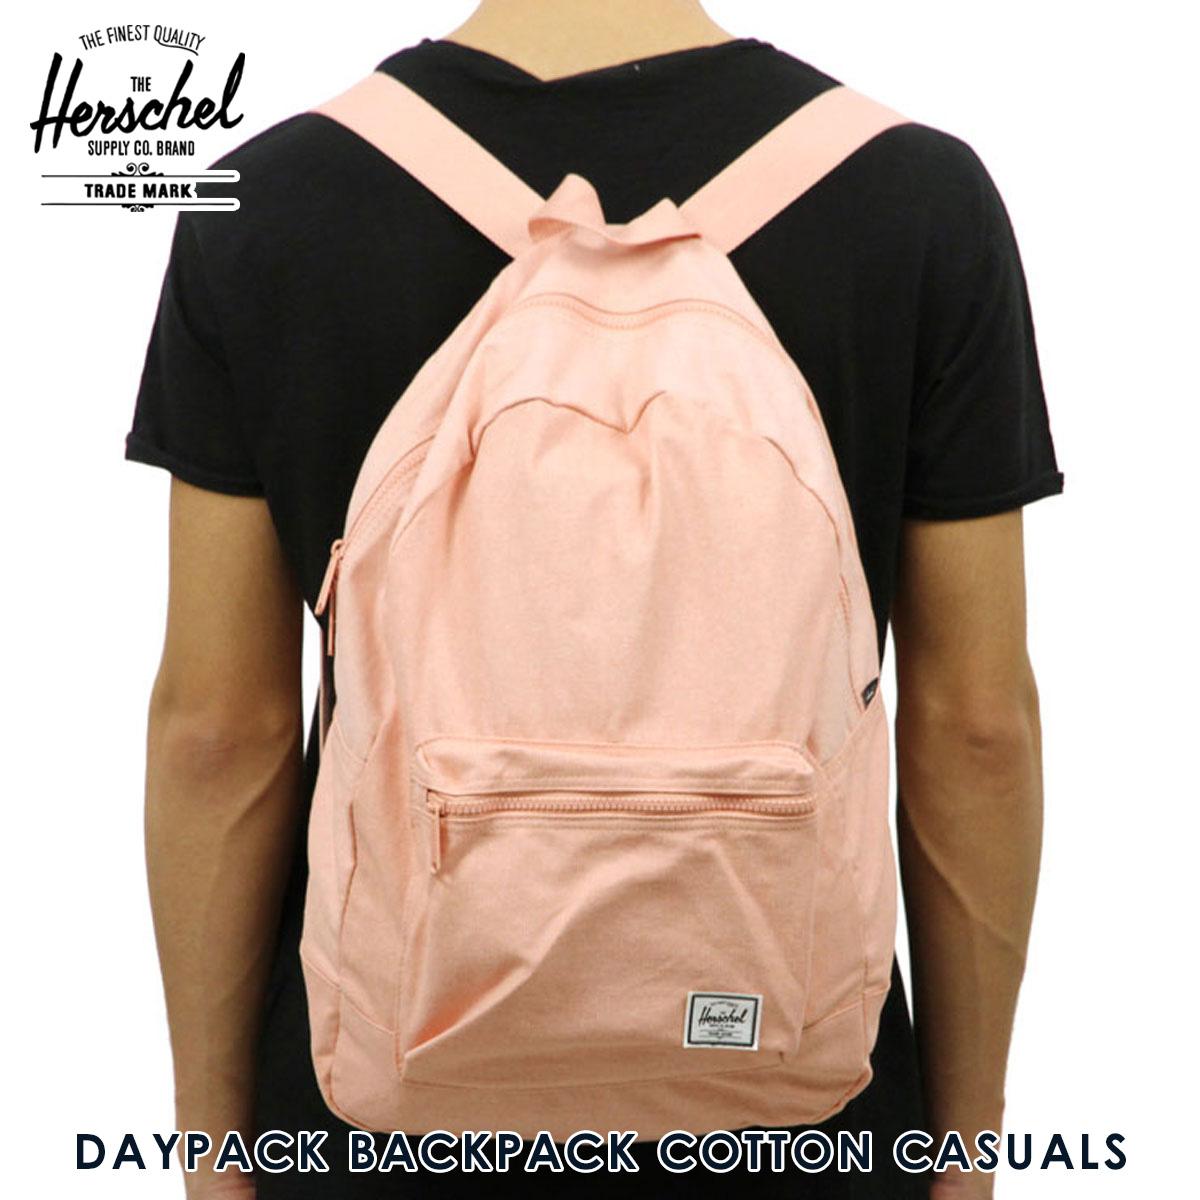 c984b77dcb Rakuten Ichiba shop MIXON  Hershel Herschel Supply regular store bag  DAYPACK BACKPACK COTTON CASUALS 10076-01506-OS APRICOT BLUSH